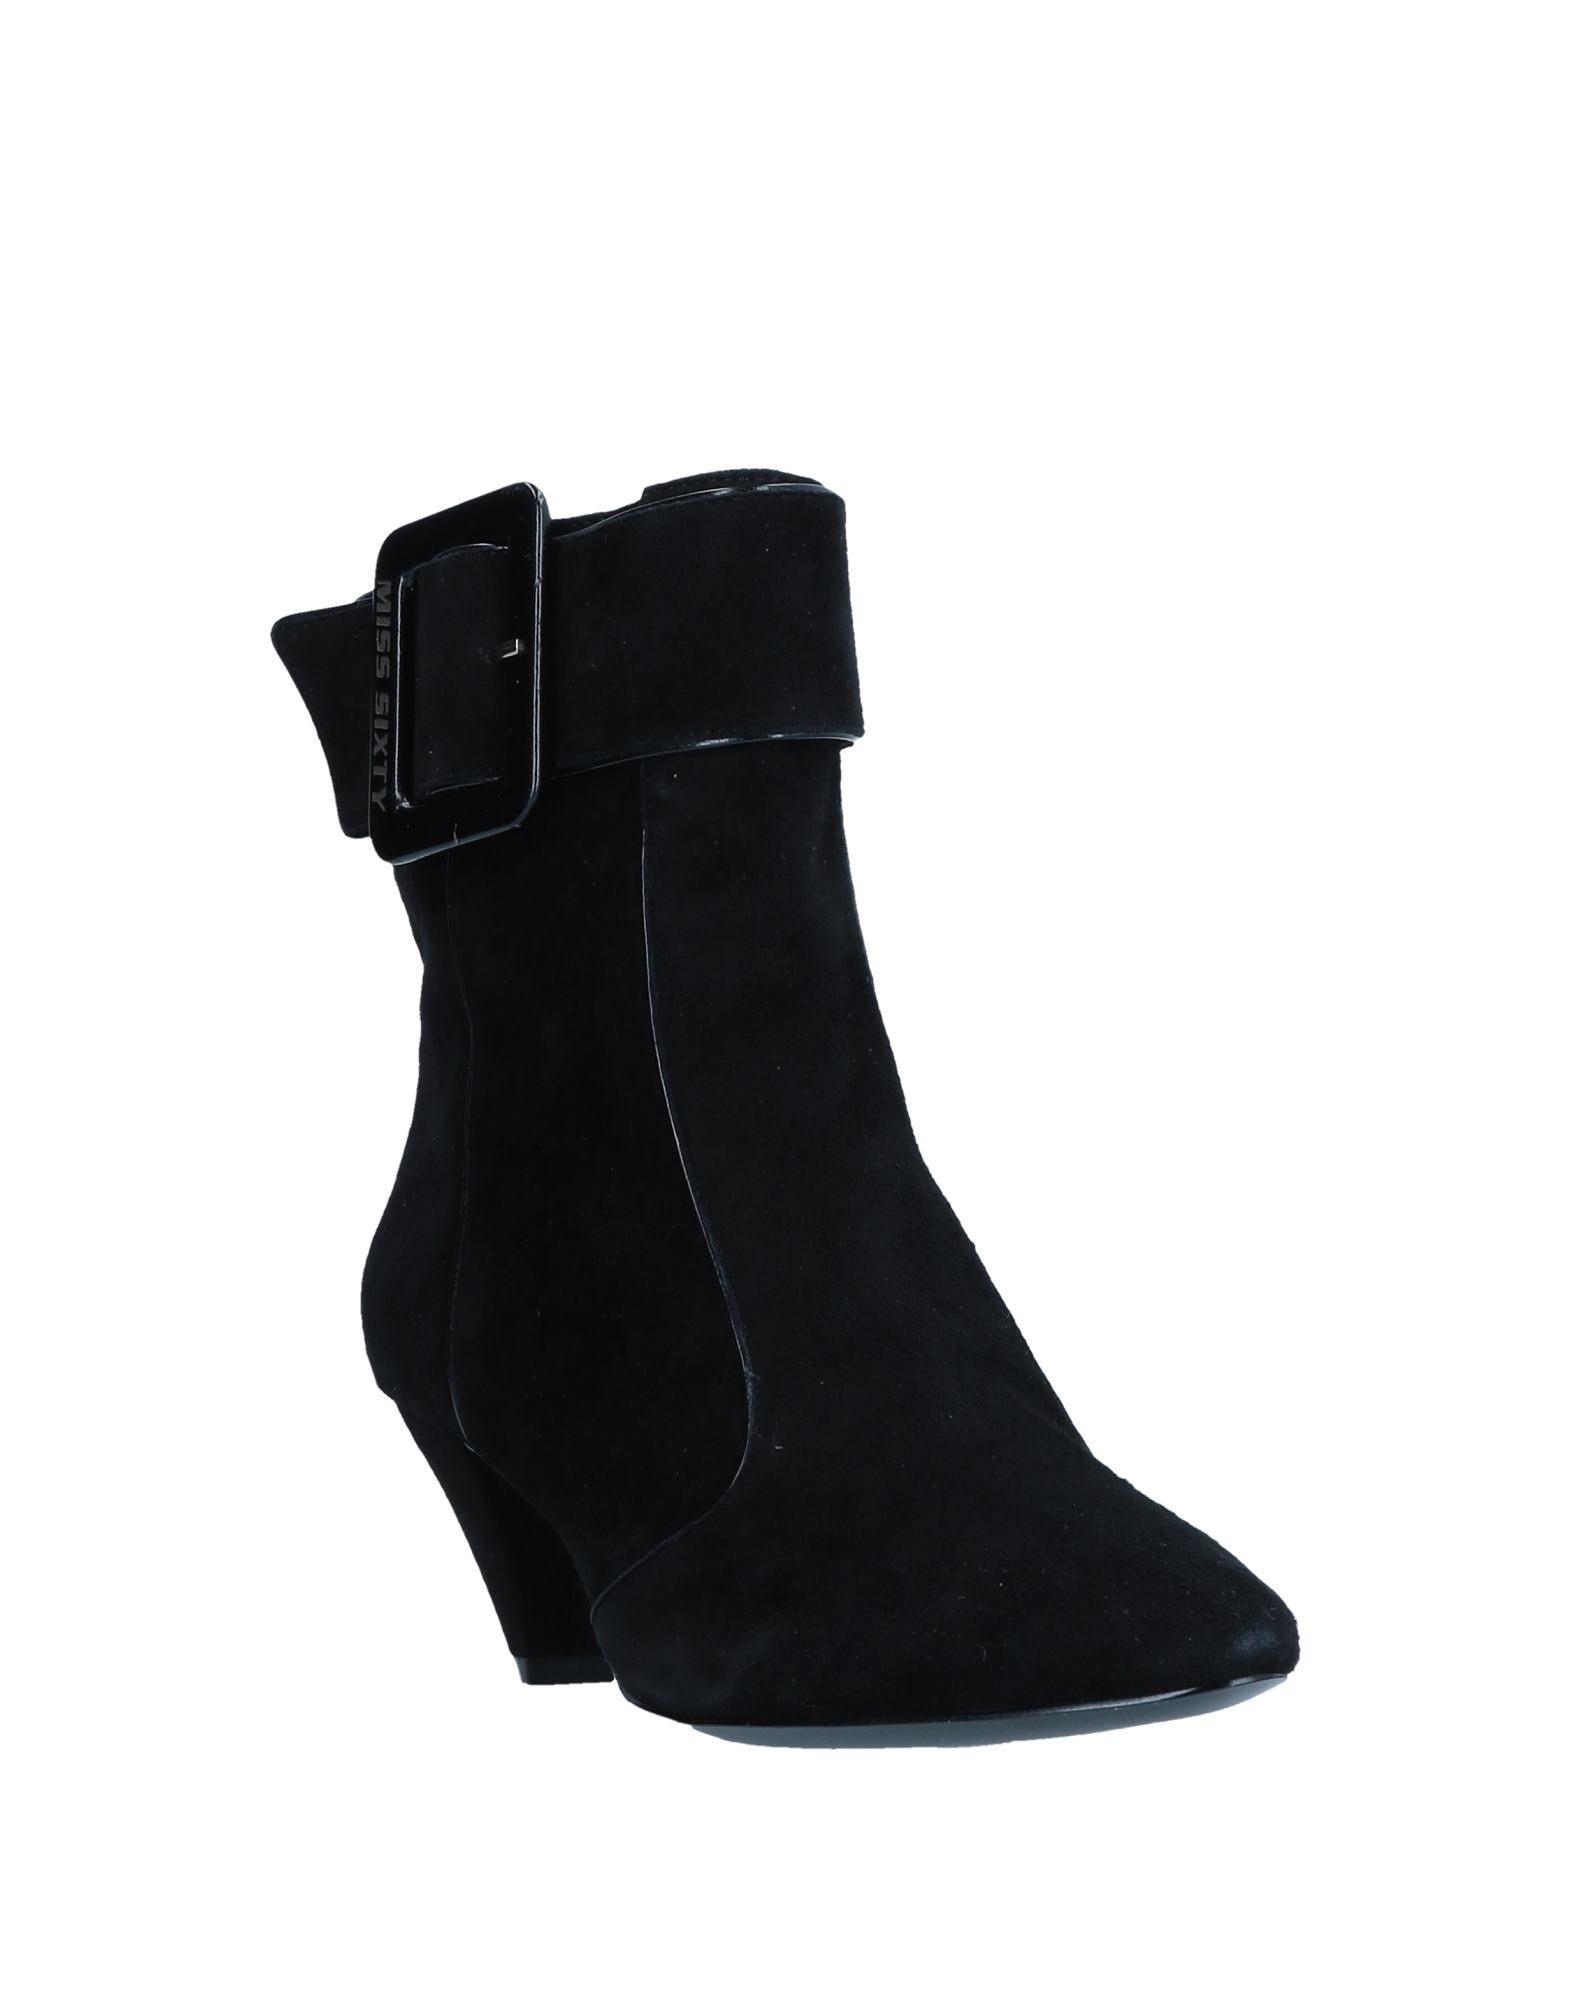 Miss Sixty Stiefelette Damen beliebte  11525391WX Gute Qualität beliebte Damen Schuhe 0799ce